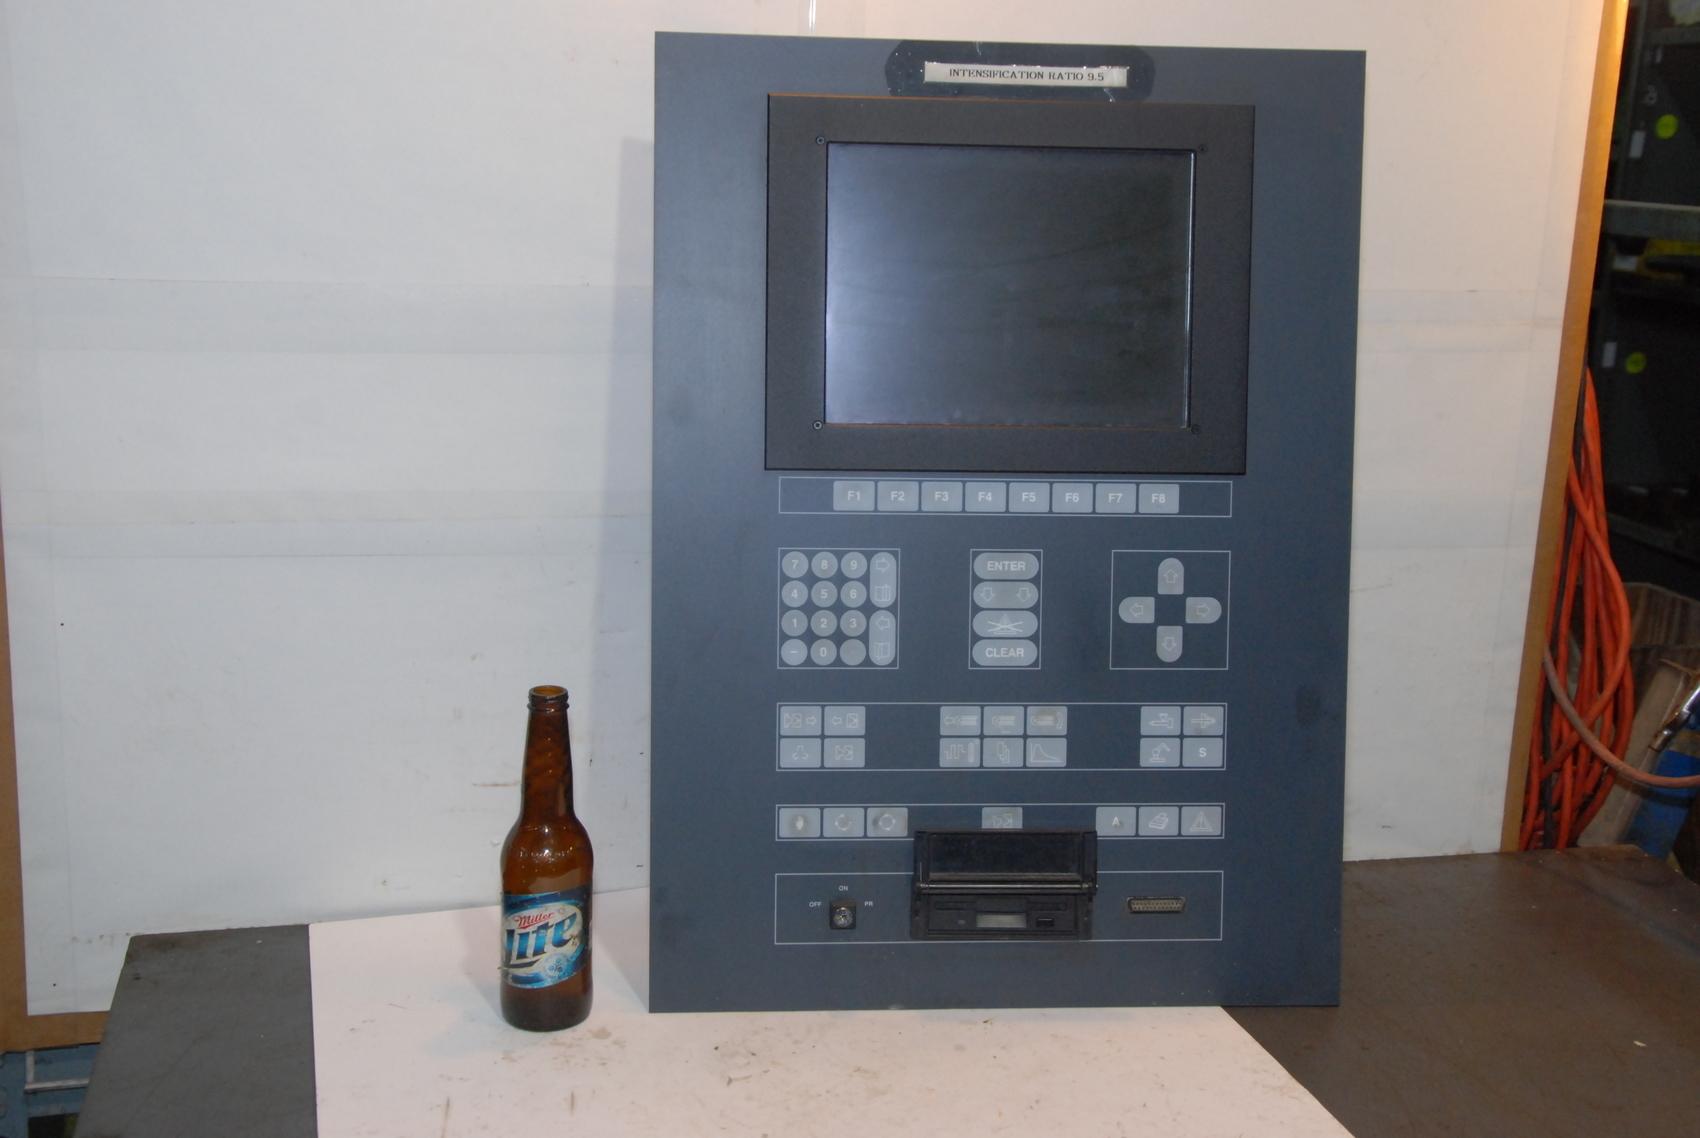 Operator panel Keba E-CON-14/10377+LCD TFT 12in,Engel injection molder